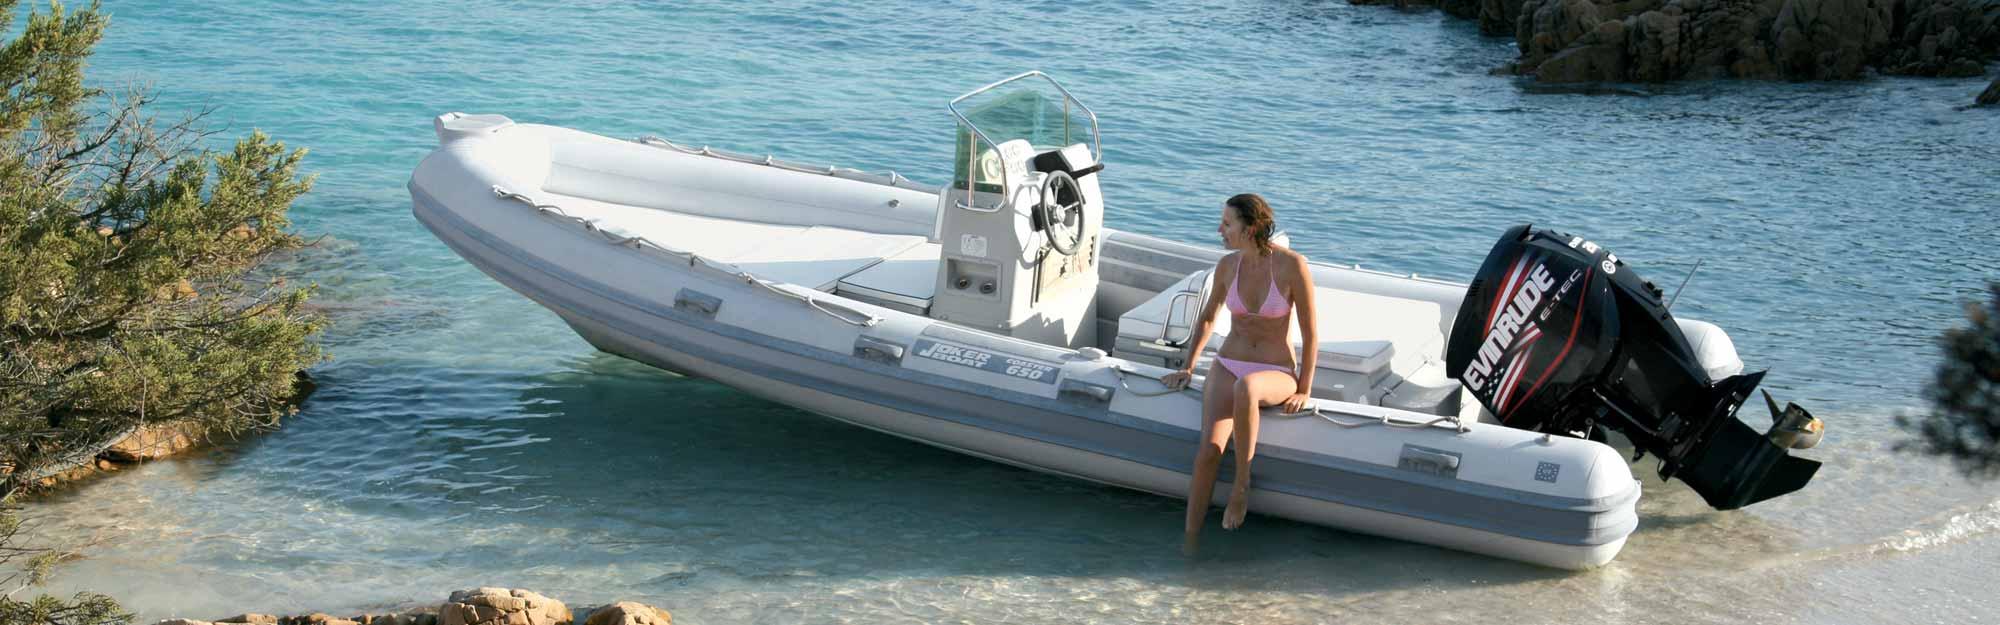 vitale-marine-vendita-gommoni-nuovi-joker-boat